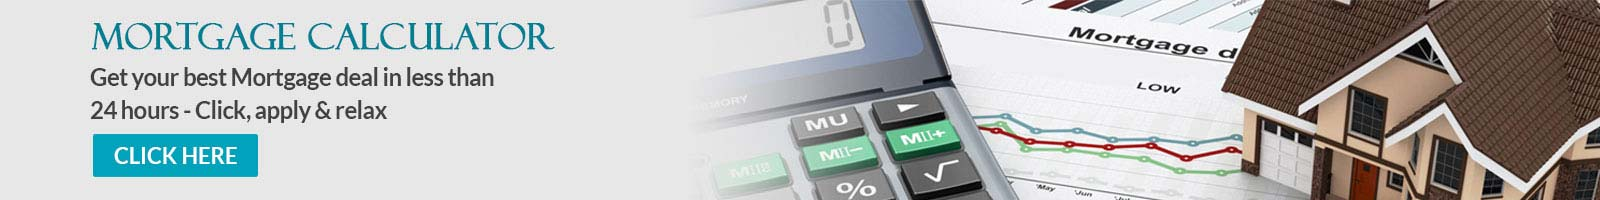 moneydila islamic finance house uae home loan in dubai